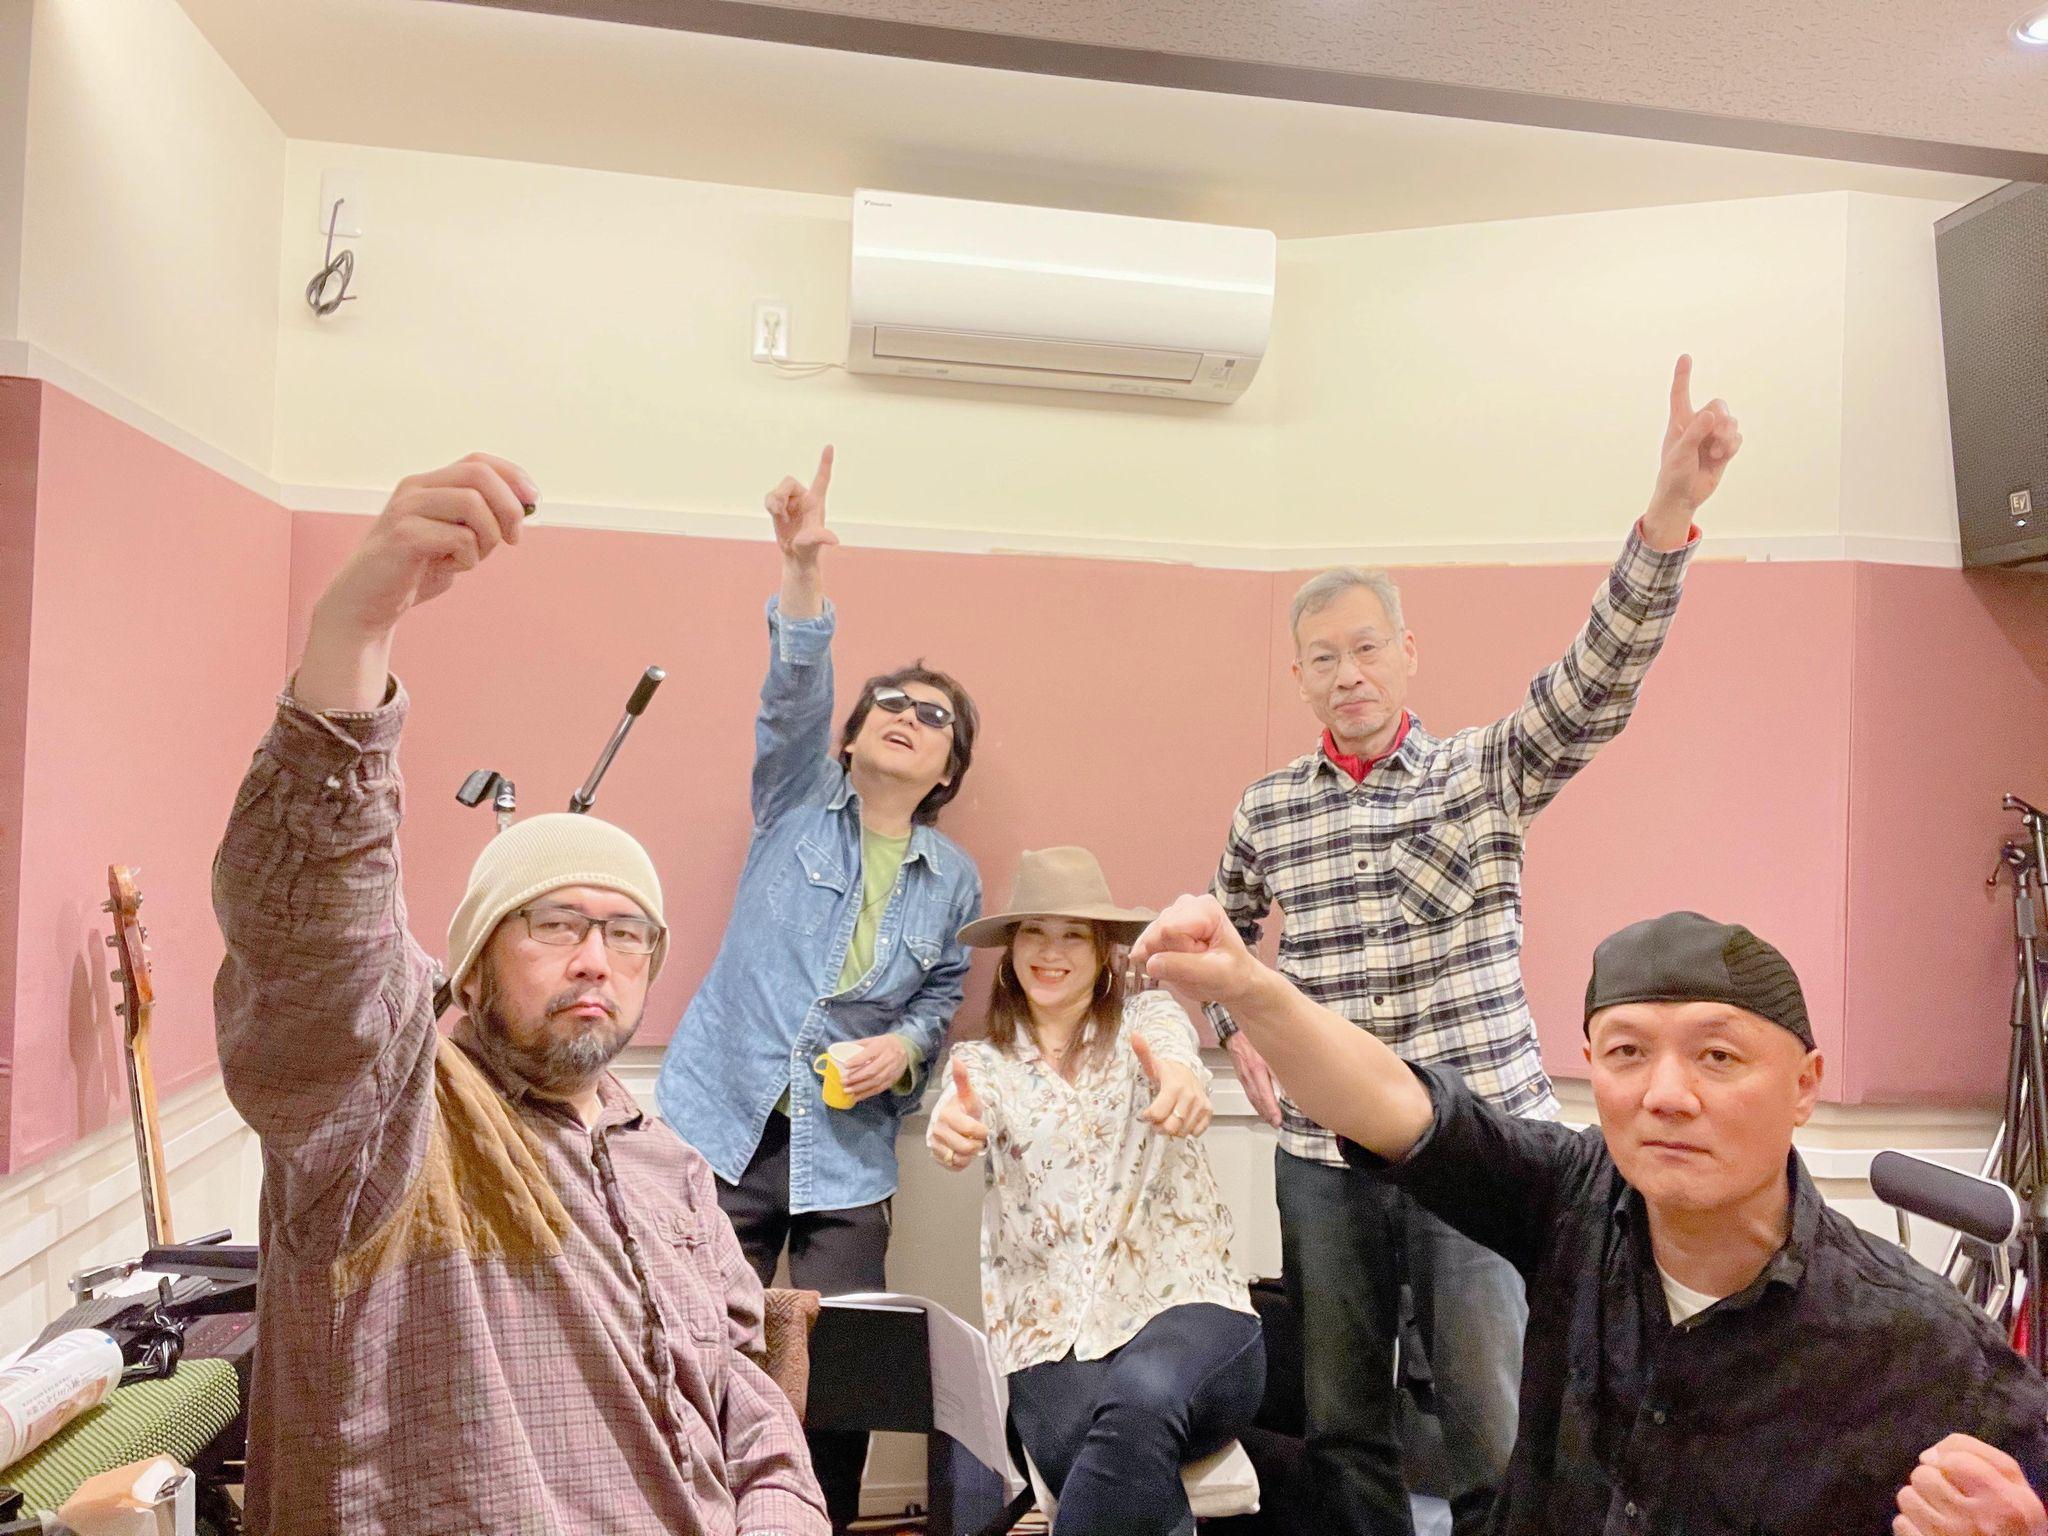 Kin☆Cherry #19「すれ違い」(西城秀樹)公開しました~!_a0088007_23472507.jpg